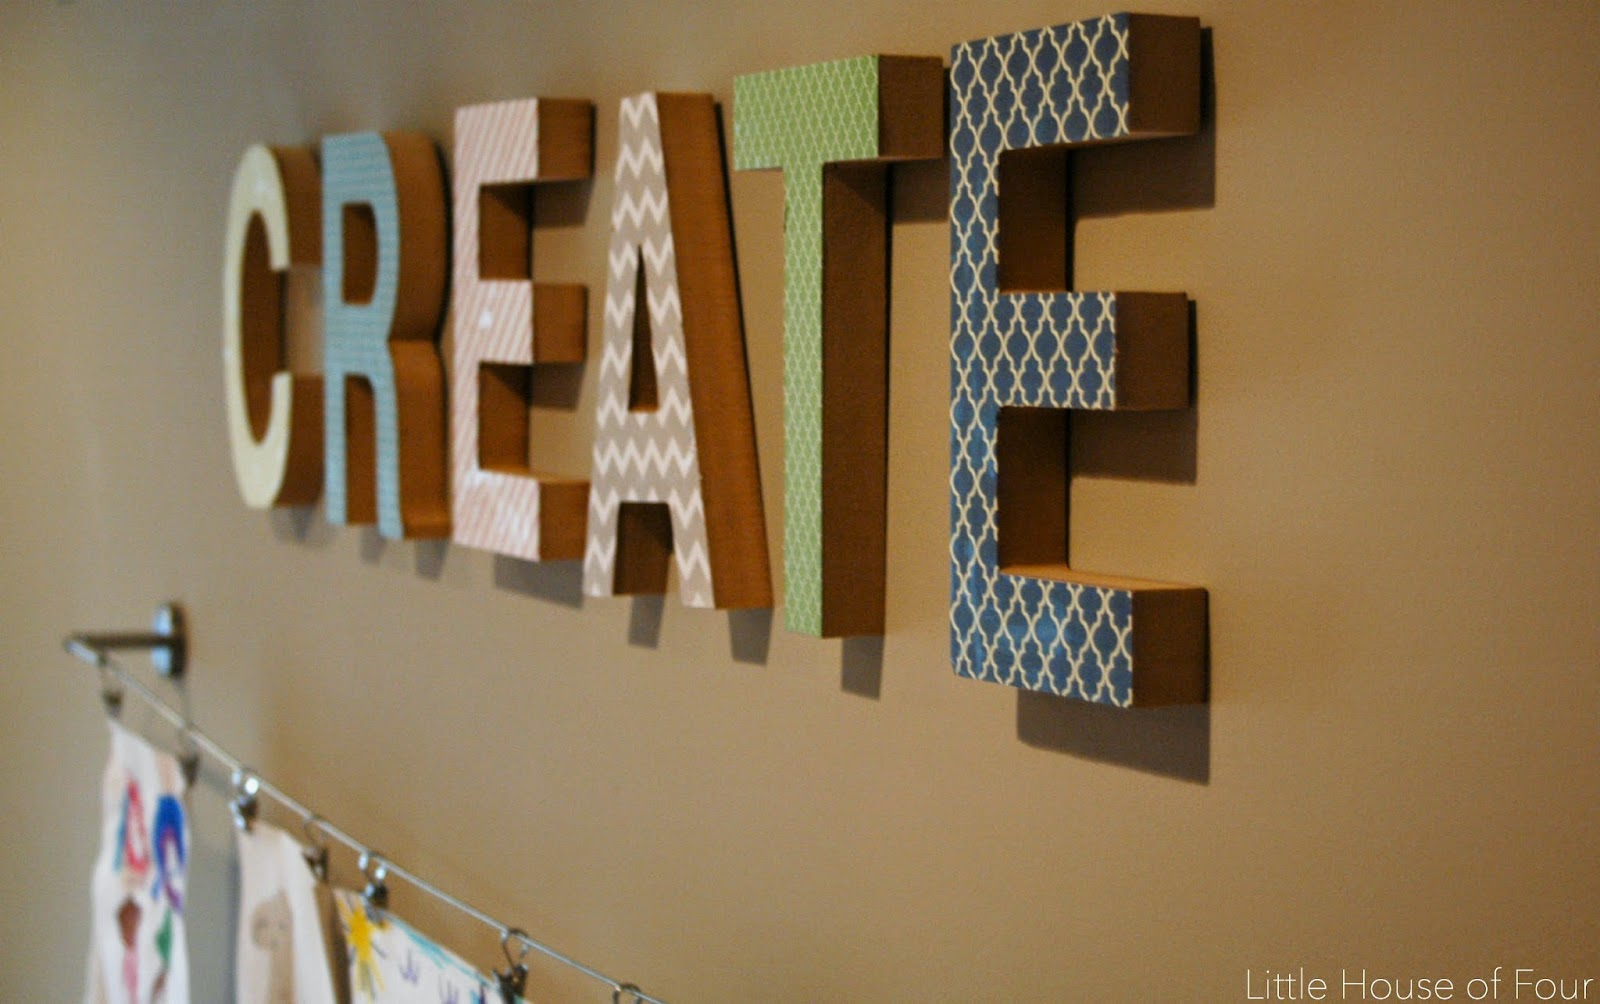 A perfectly organized art space for kids. - littlehouseoffour.com